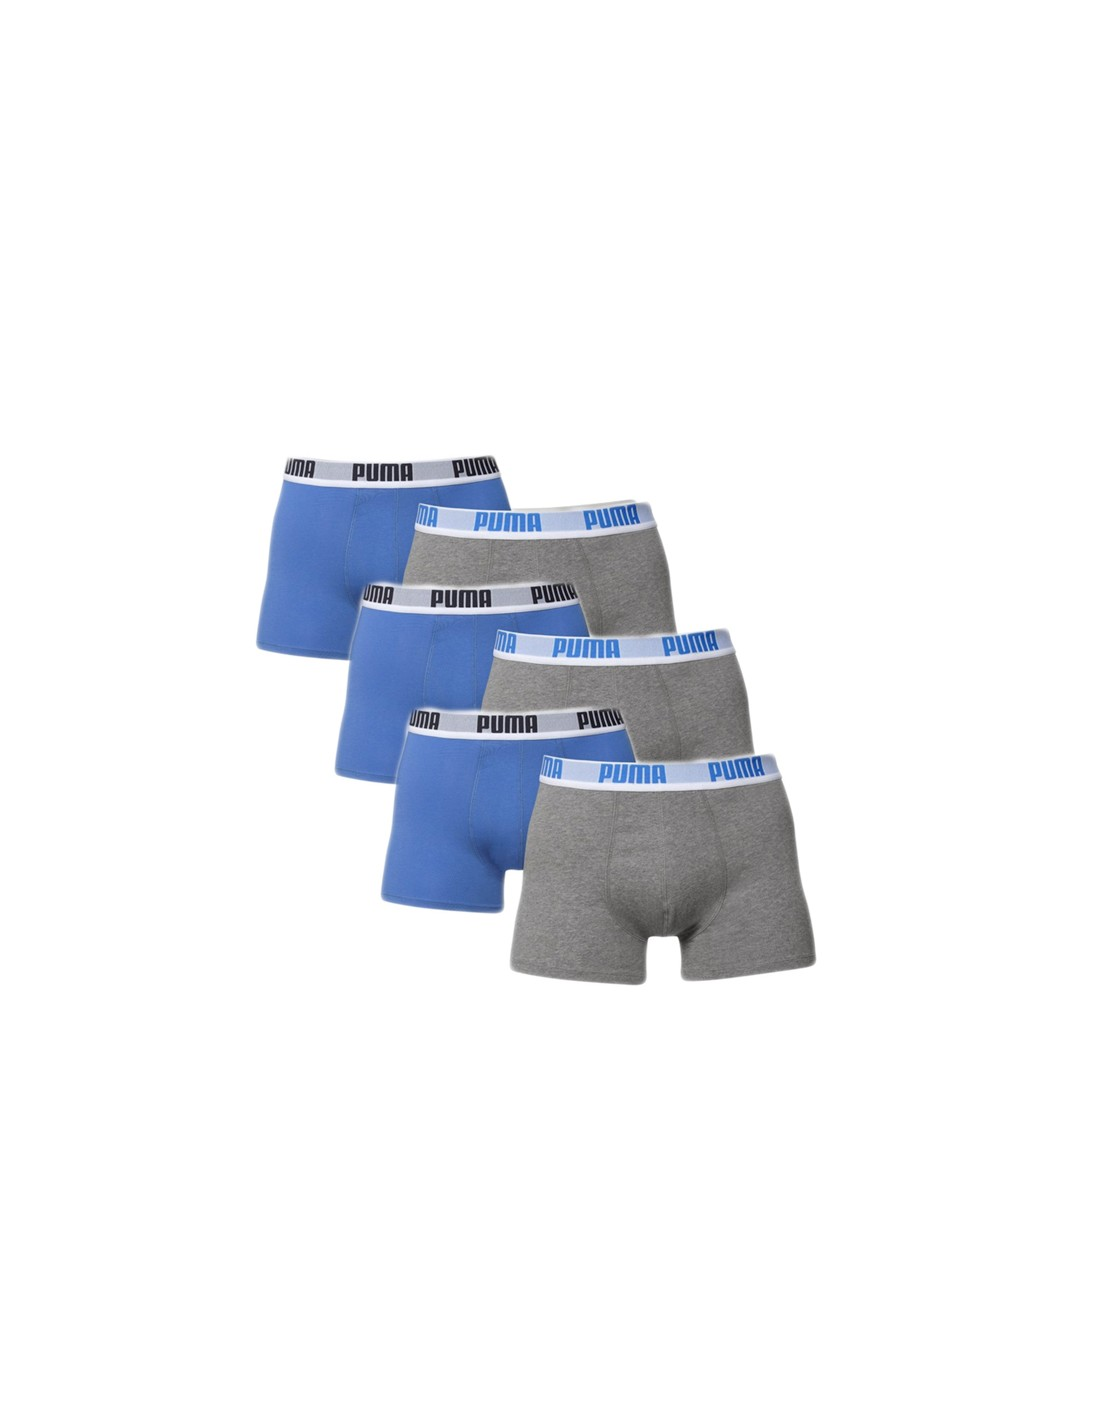 Puma Boxershort 6 Pack Blue Grey